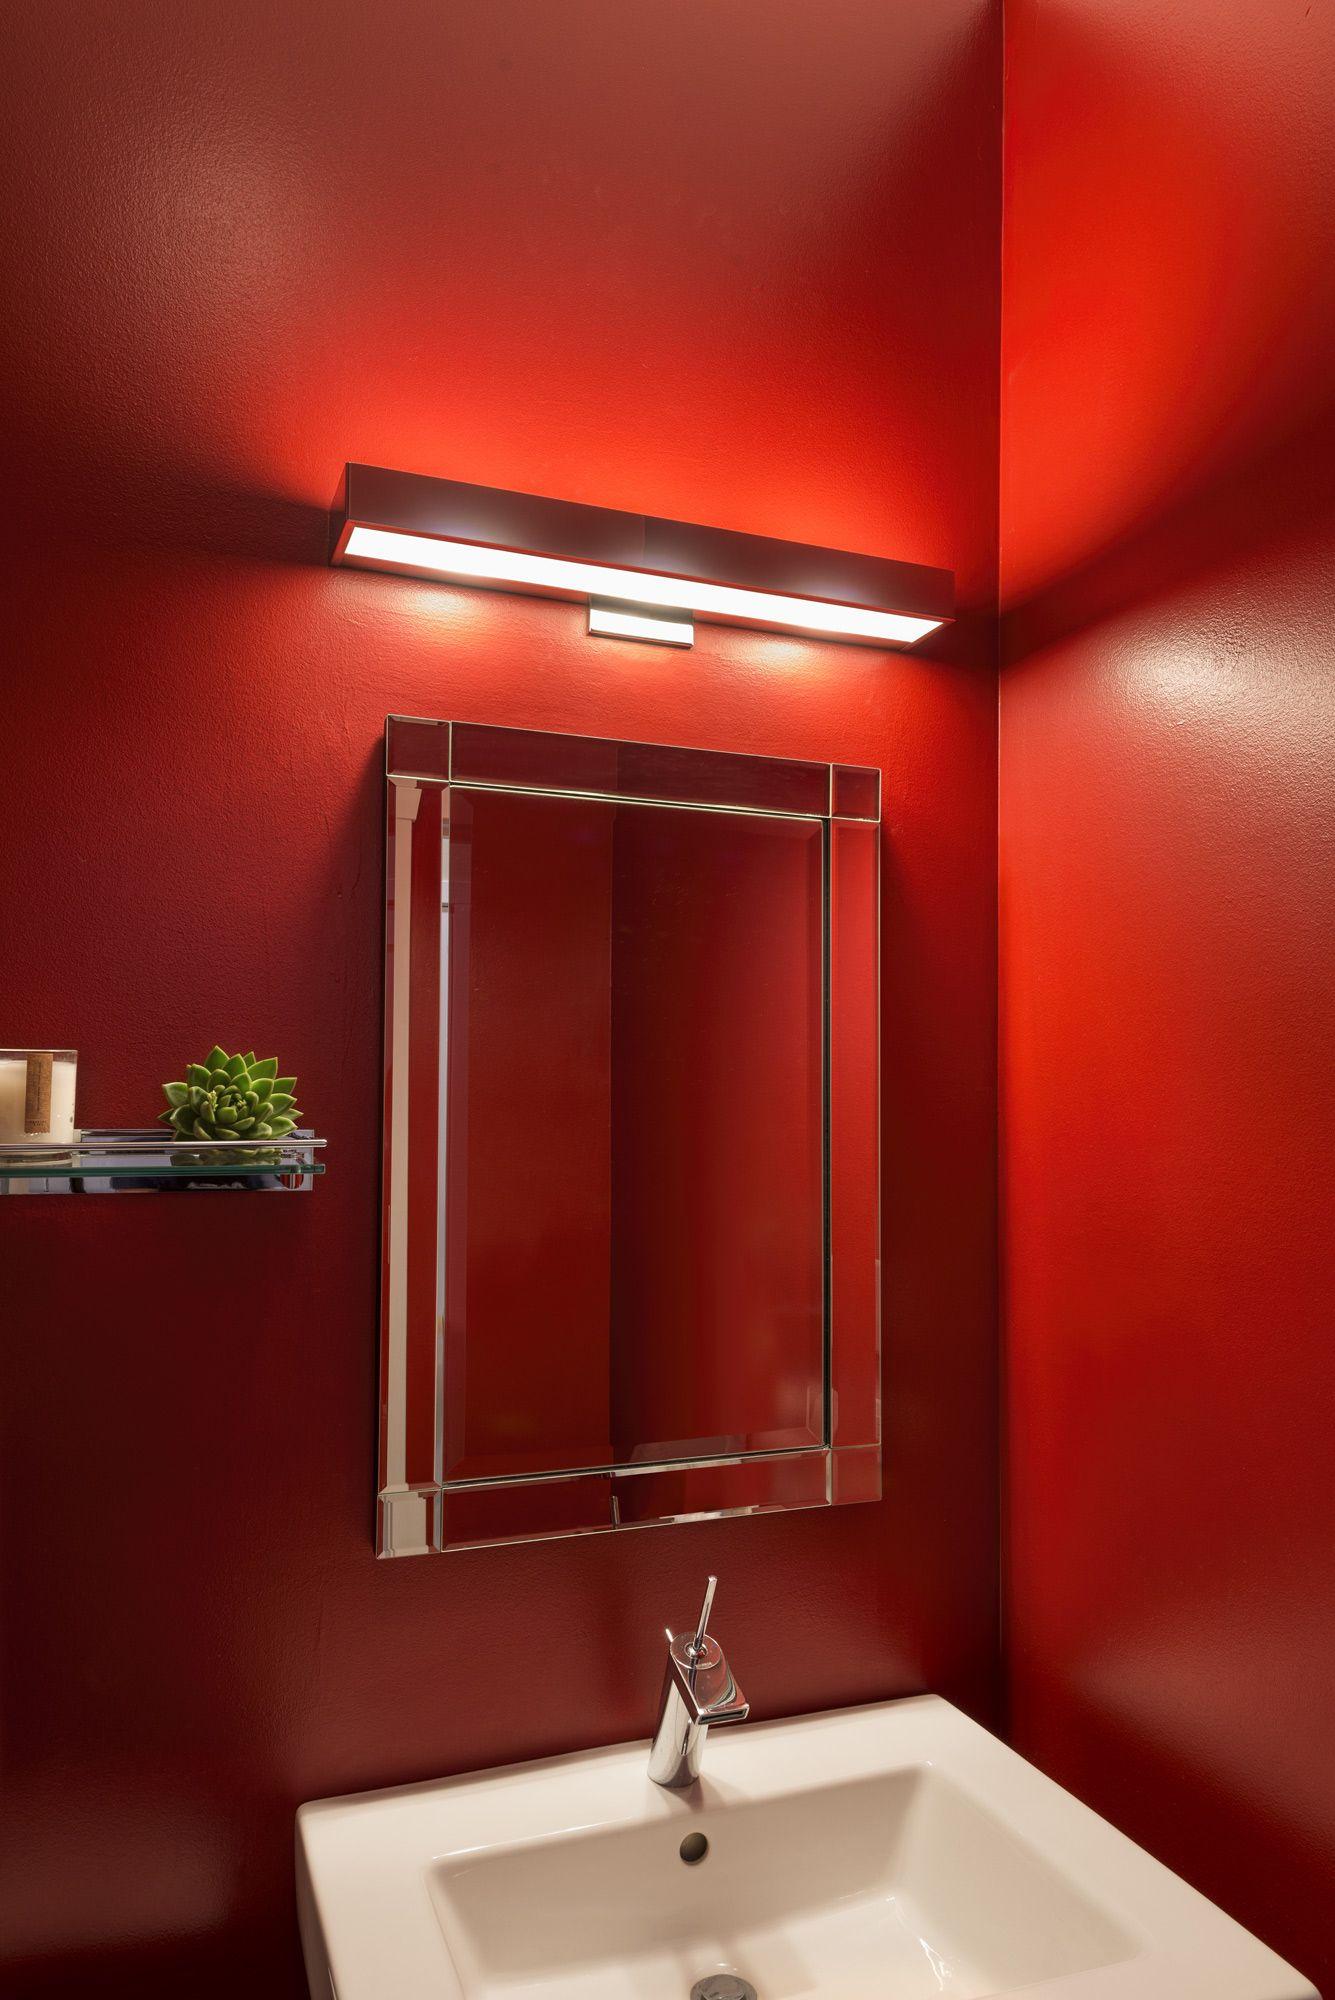 Halogen Bathroom Sconces alpha 24 halogen wall sconceedge lighting | designer credit